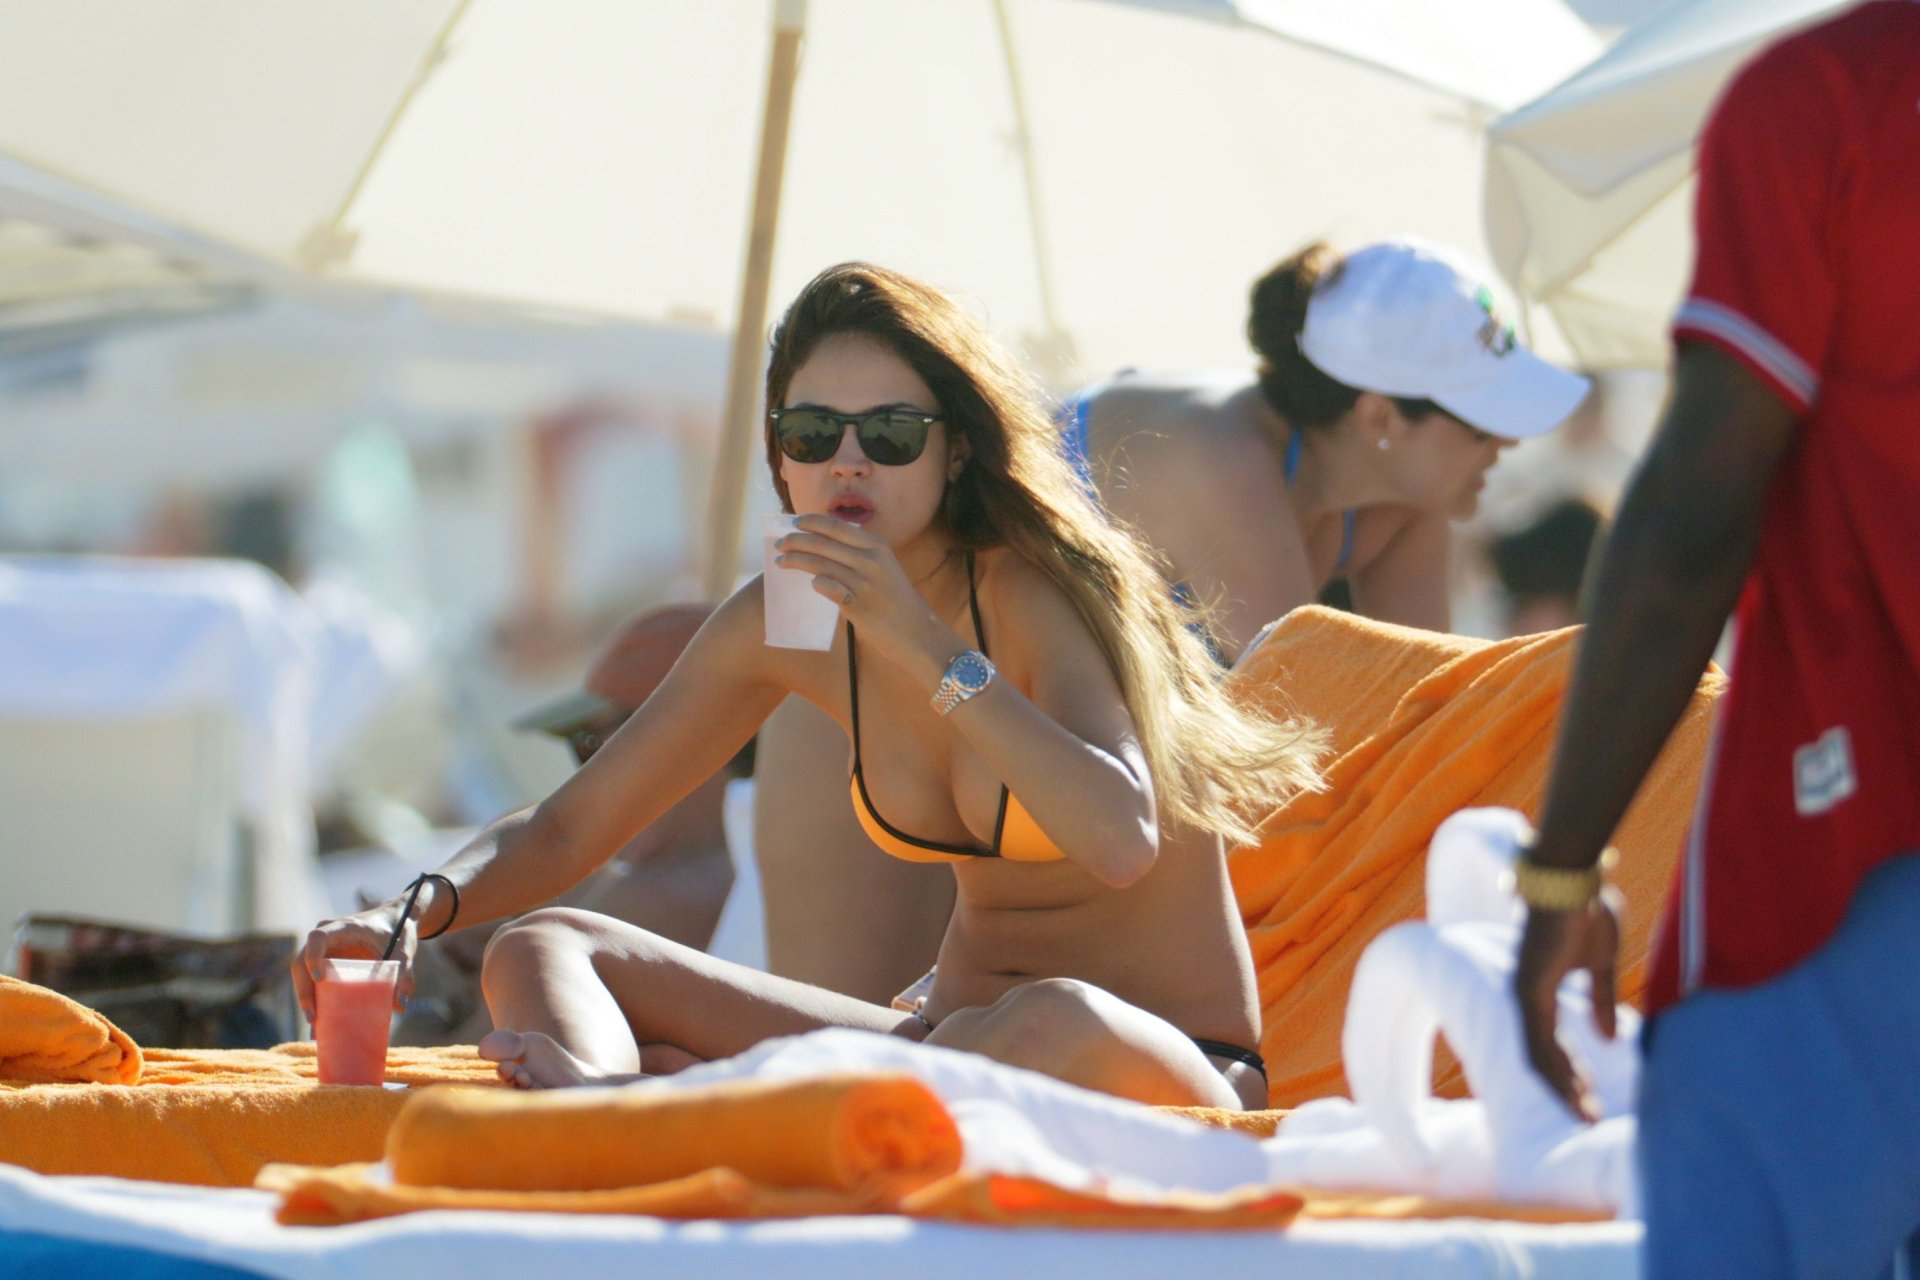 eiza gonz lez in a bikini 15 photos thefappening